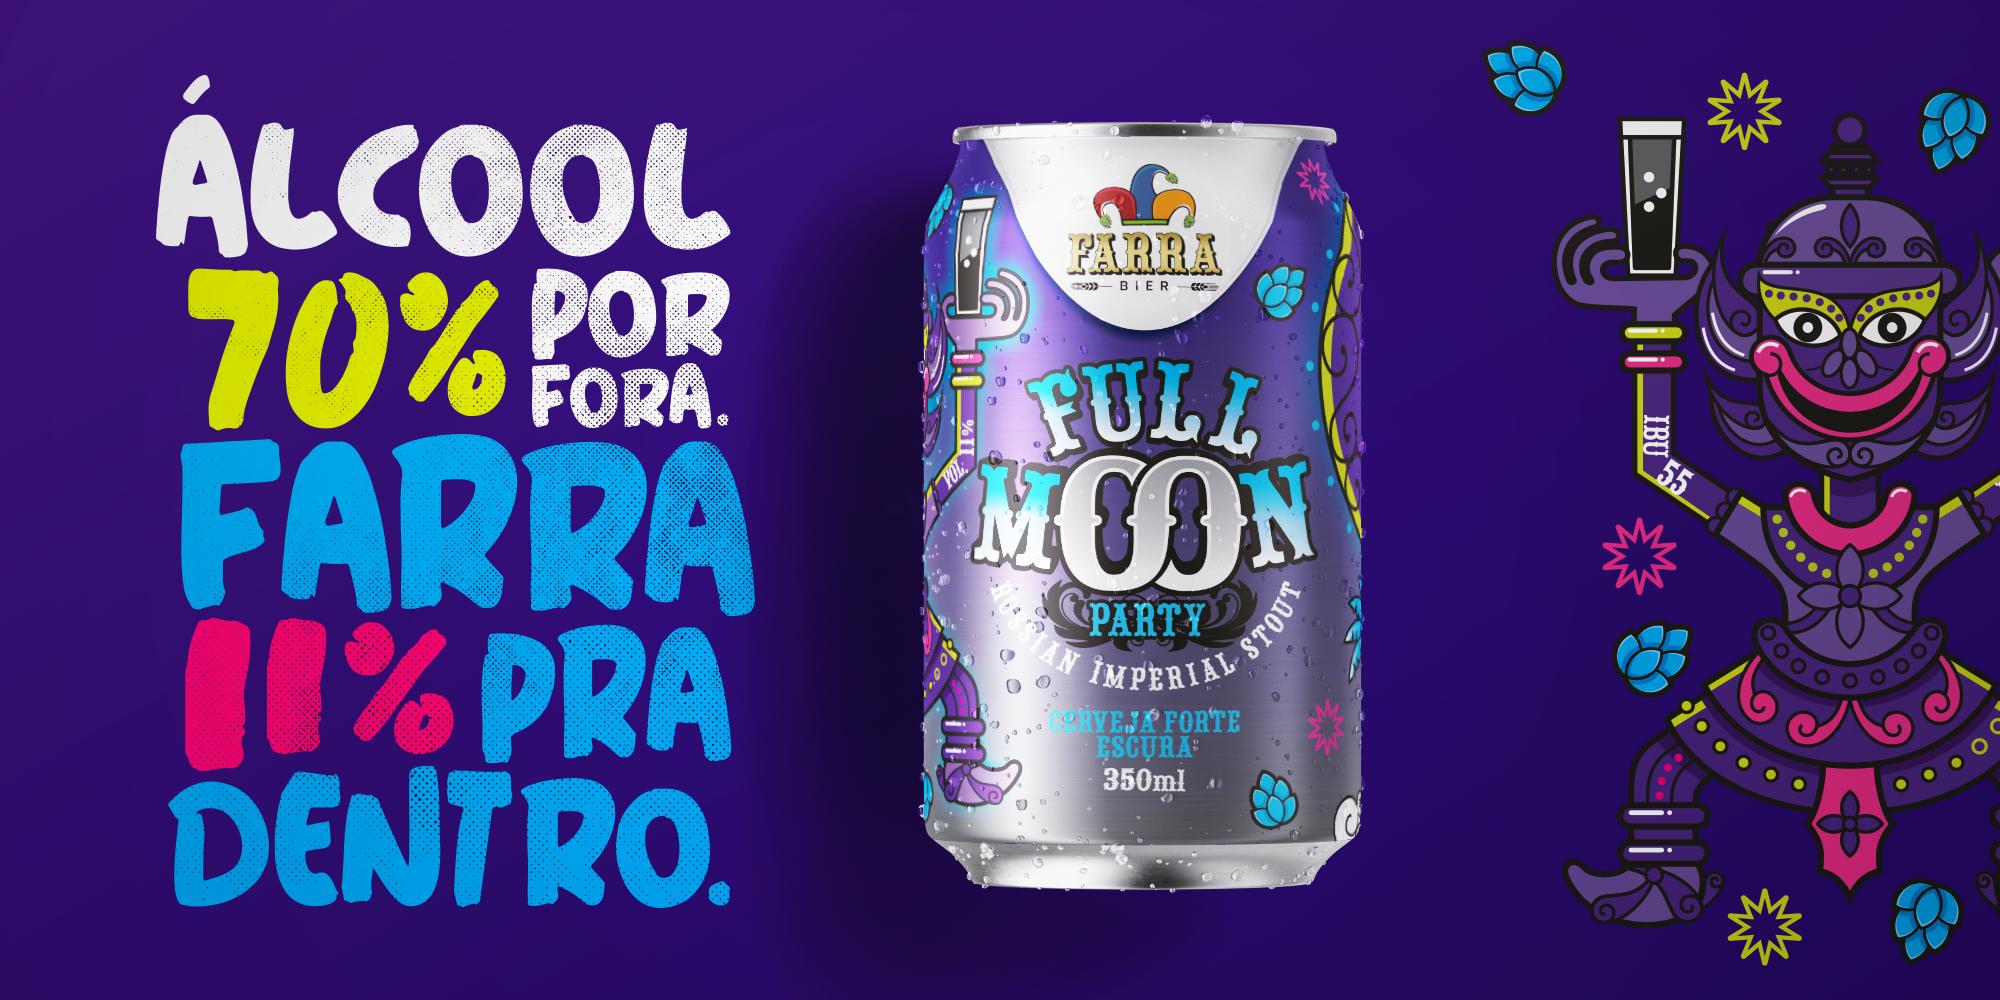 Banca_Farra-2000x1000_Full-Moon-3